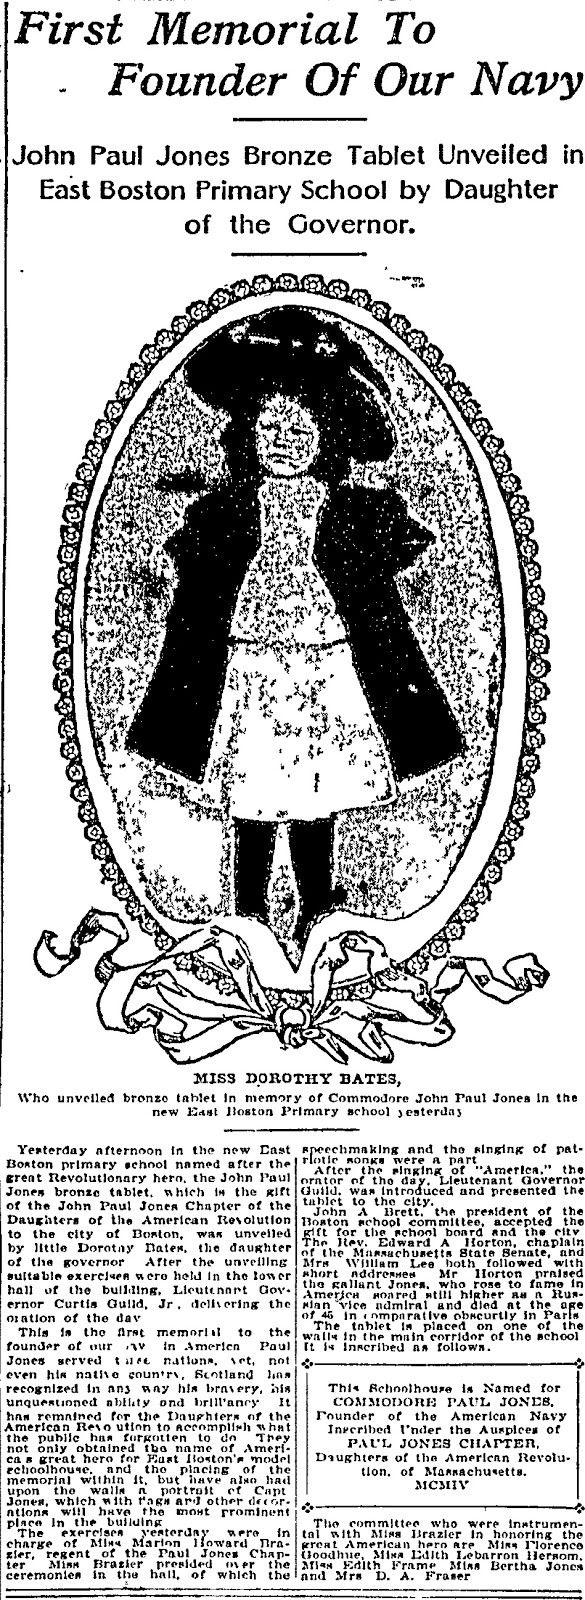 Theraconteuseexpose john paul jones last to recieve medal in john paul jones bronze tablet unveiled in east boston primary school date saturday april 16 1904 paper boston journal boston massachusetts issue buycottarizona